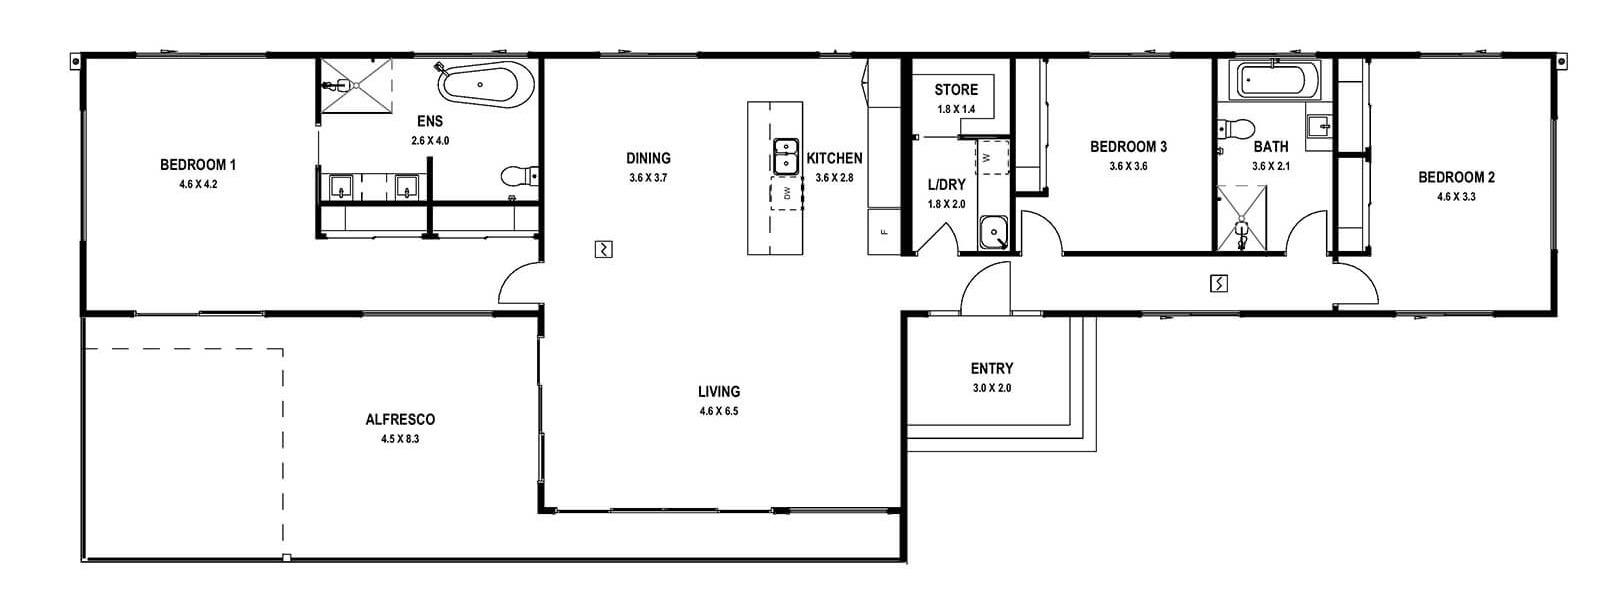 north-arm-cove-floorplan